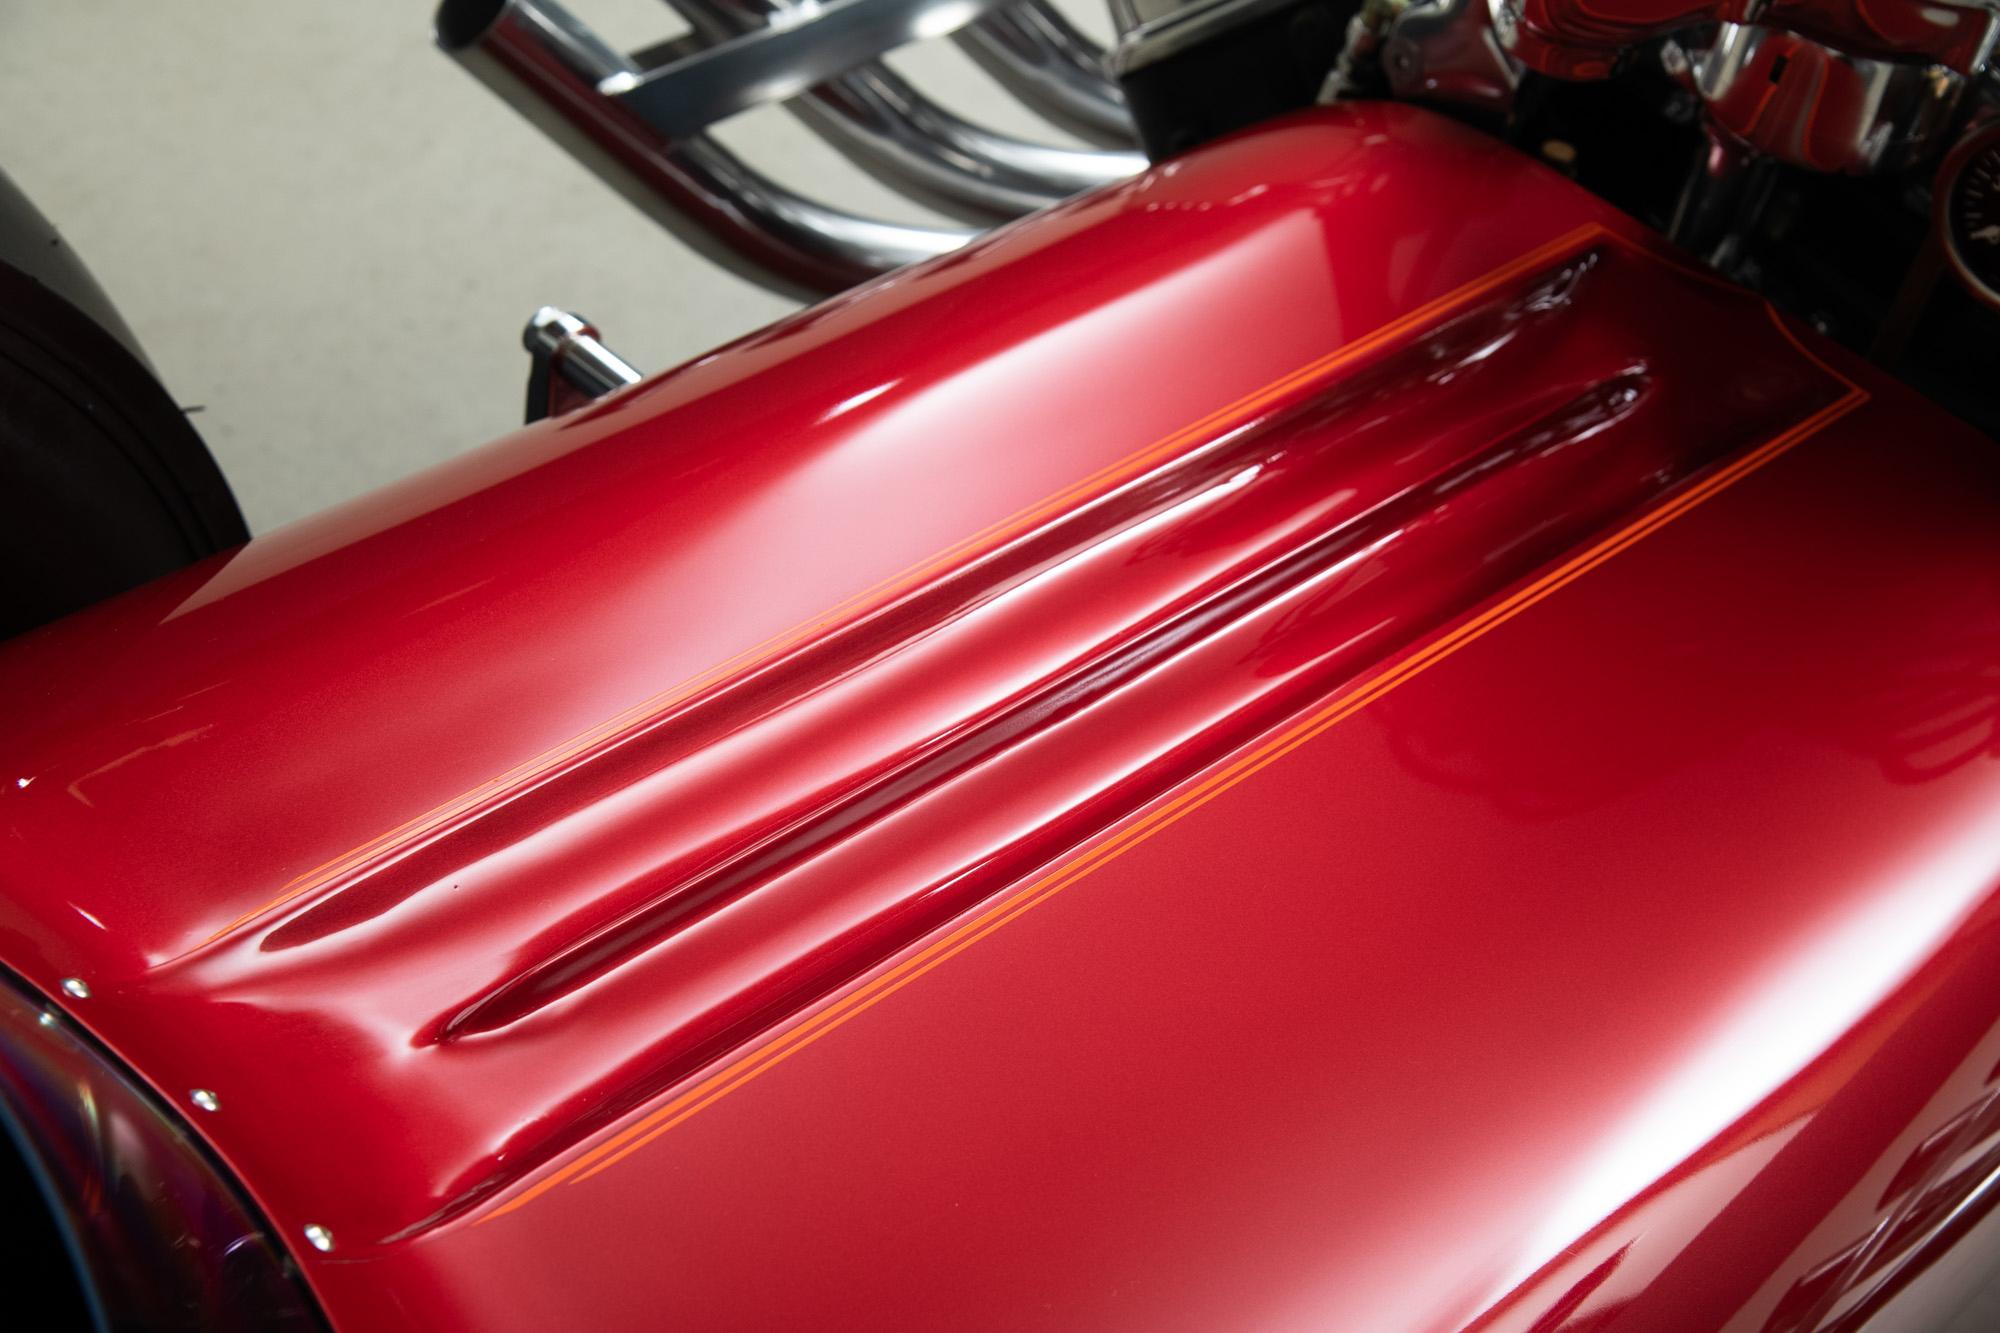 1964 Fuller/Roberts Starlite III Top Fuel Dragster, RED